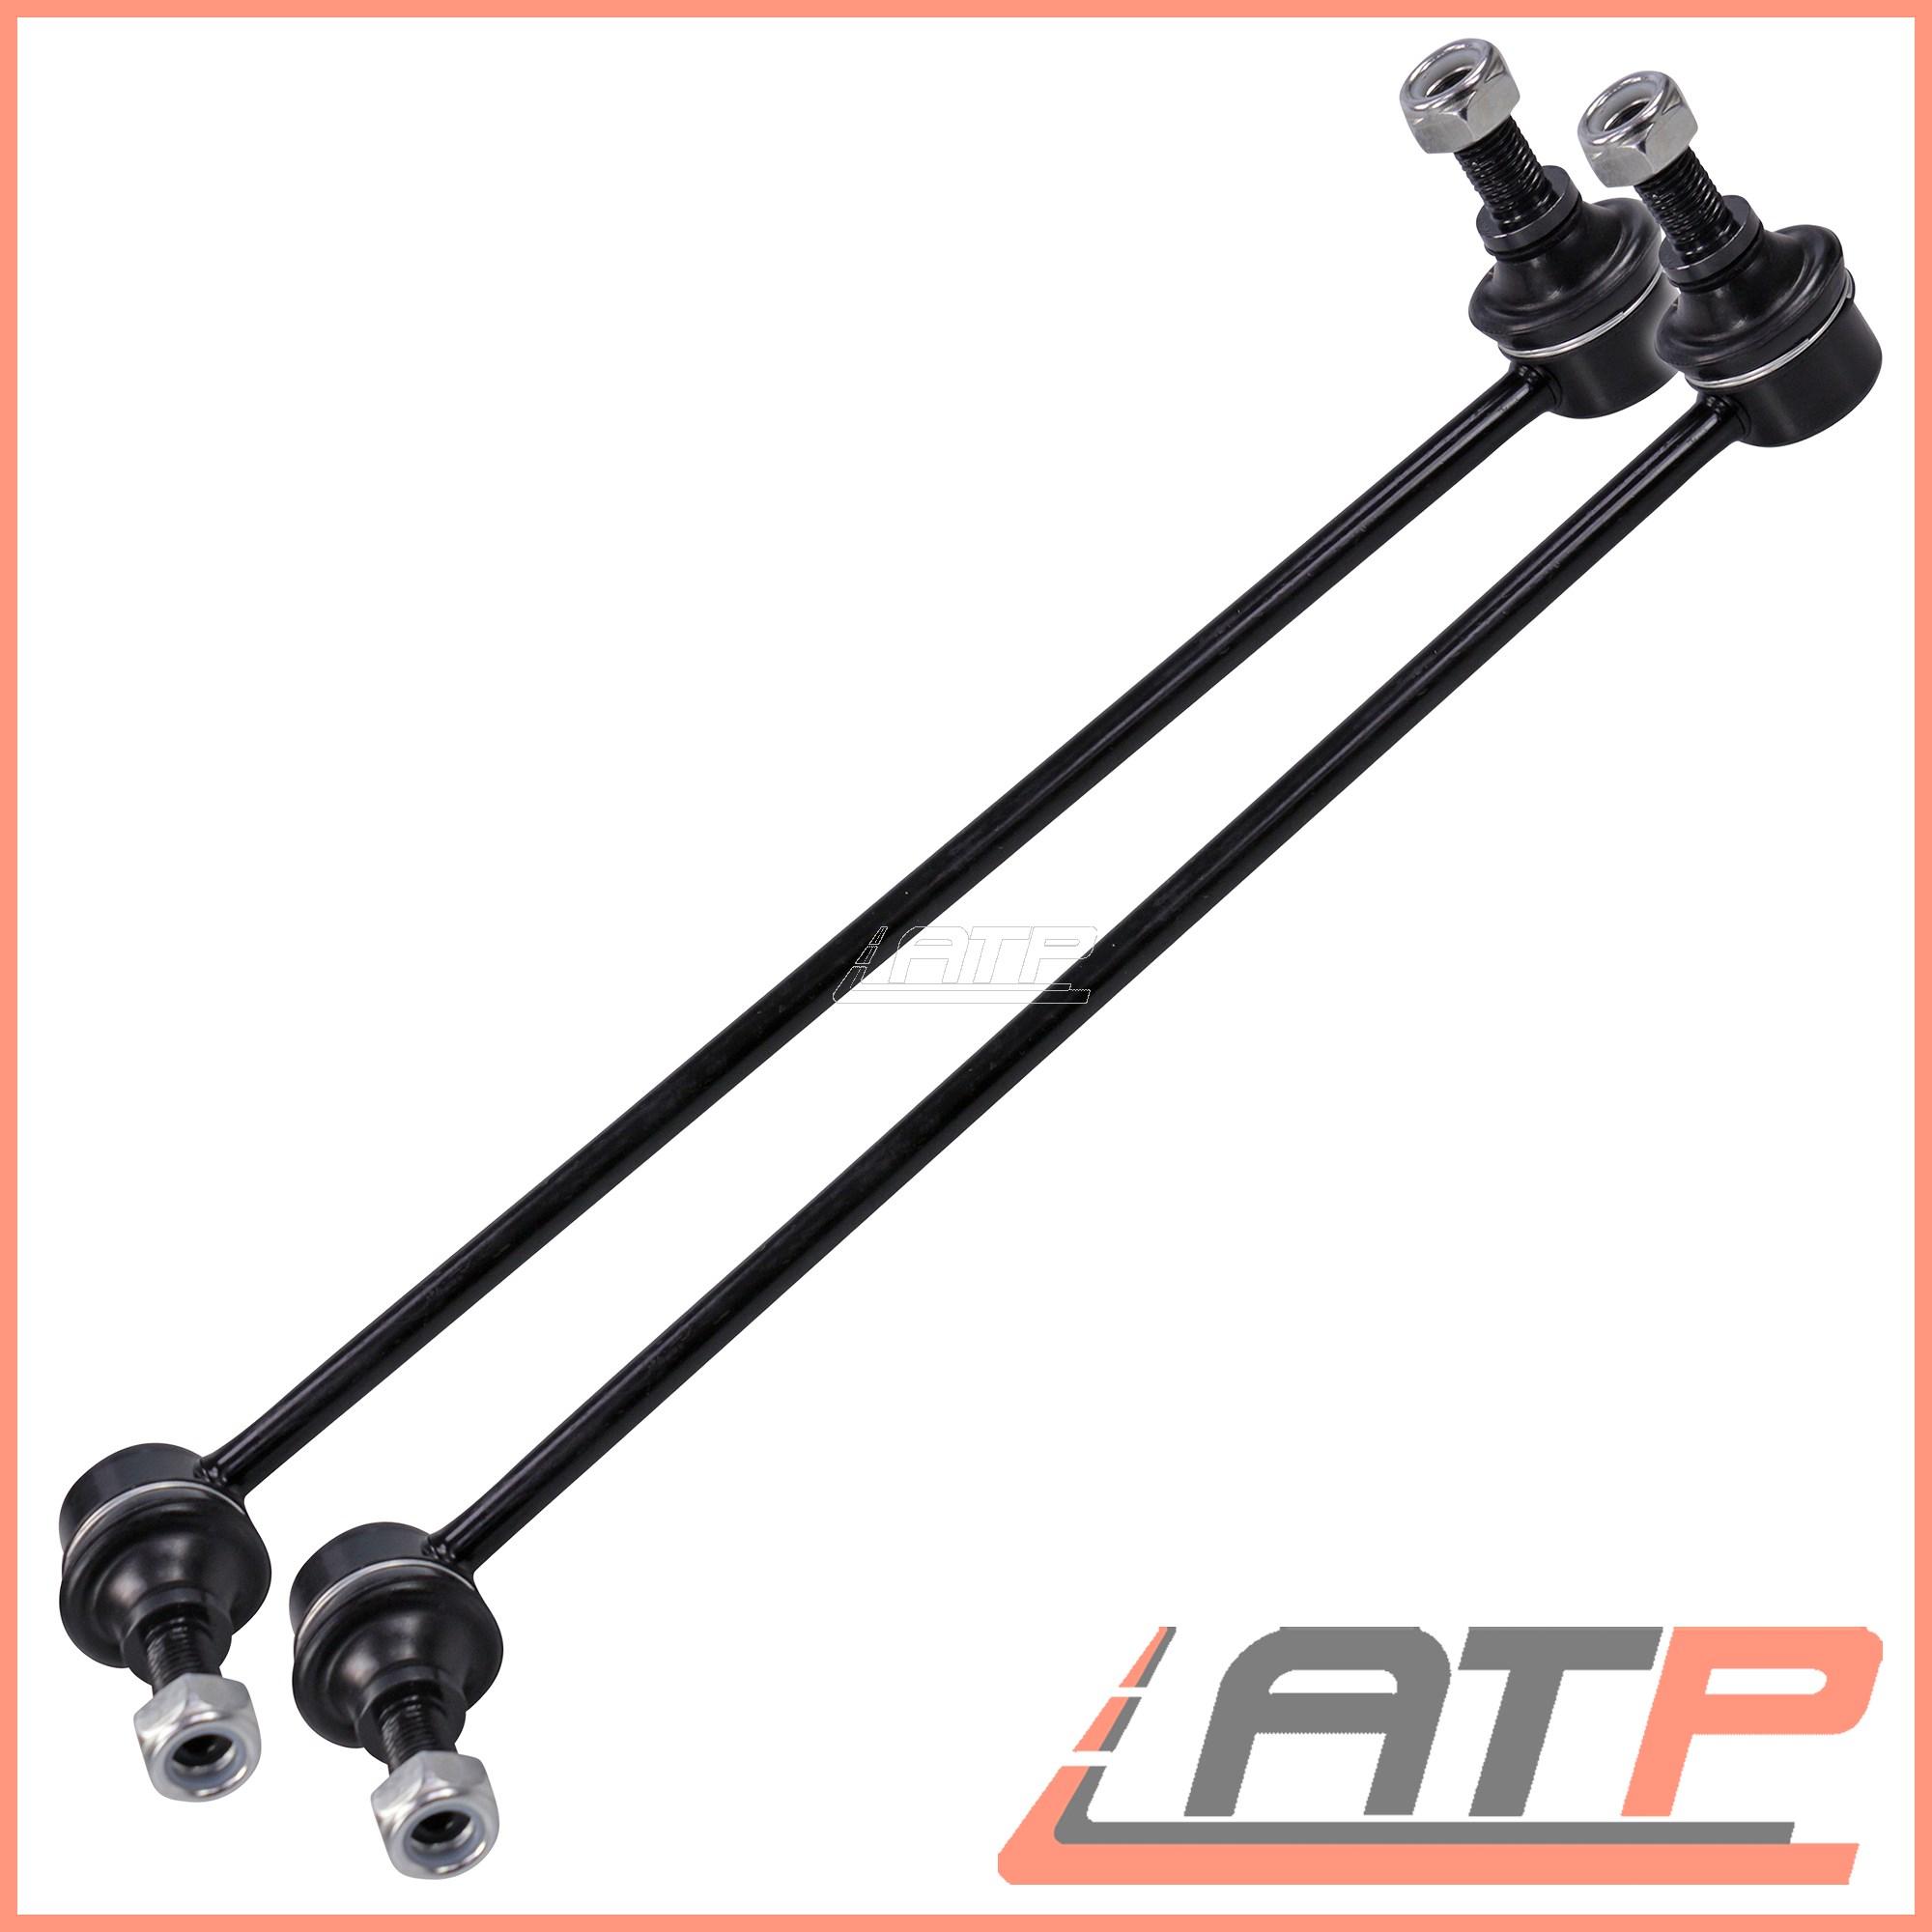 2x FRONT STABILISER ANTI-ROLL BAR DROP LINK VW PASSAT 36 10 CC 08-12 3C